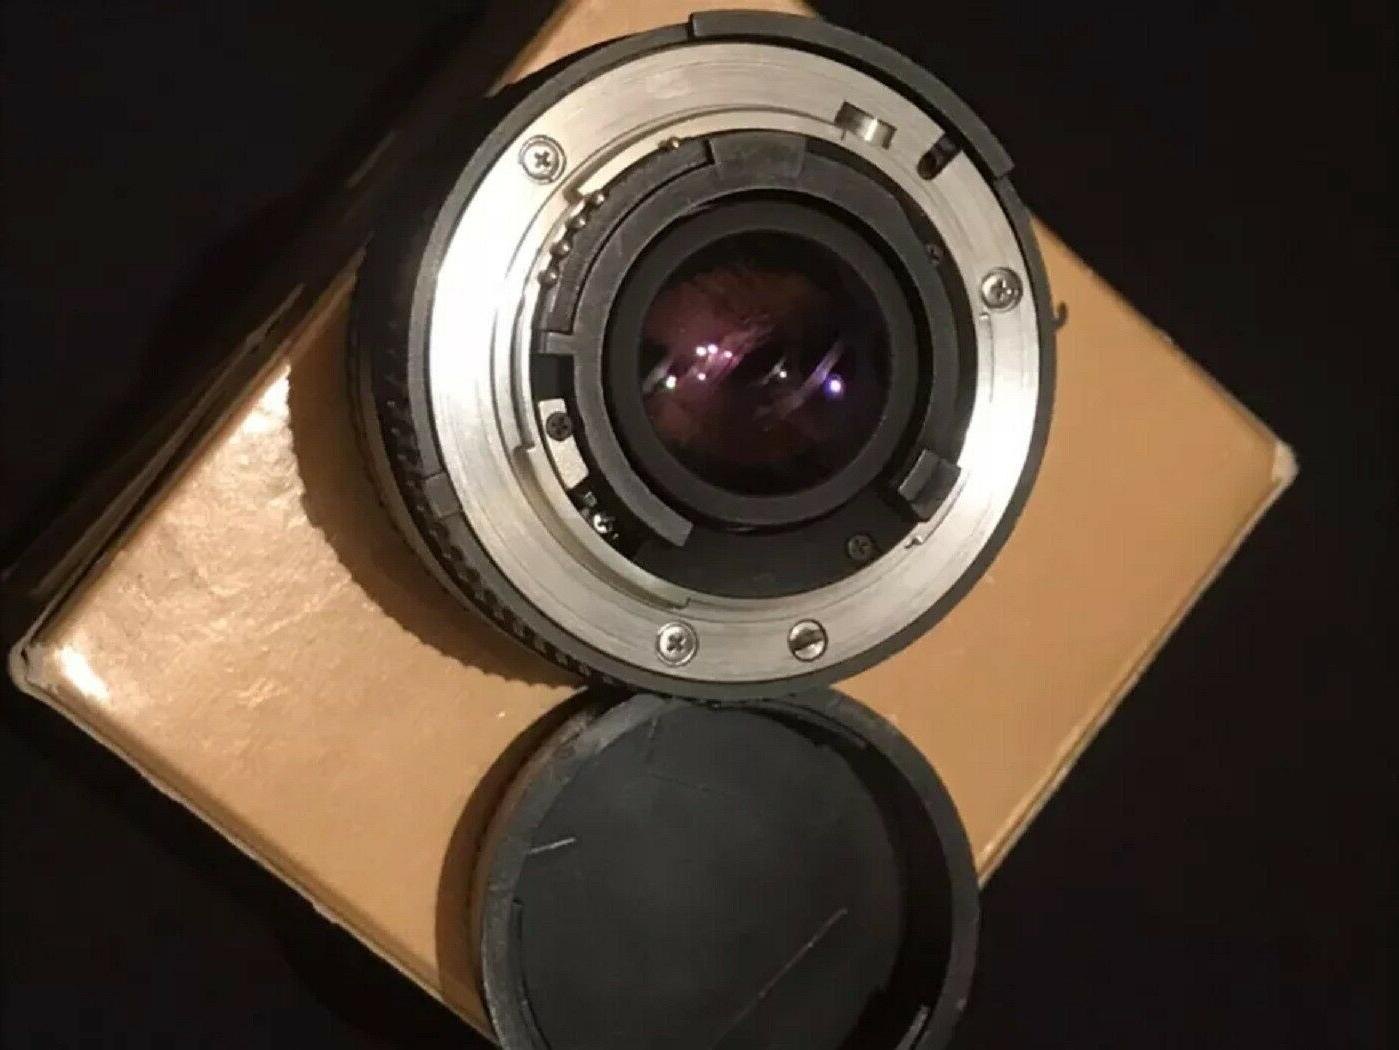 f/1.8D for Nikon DSLR Cameras